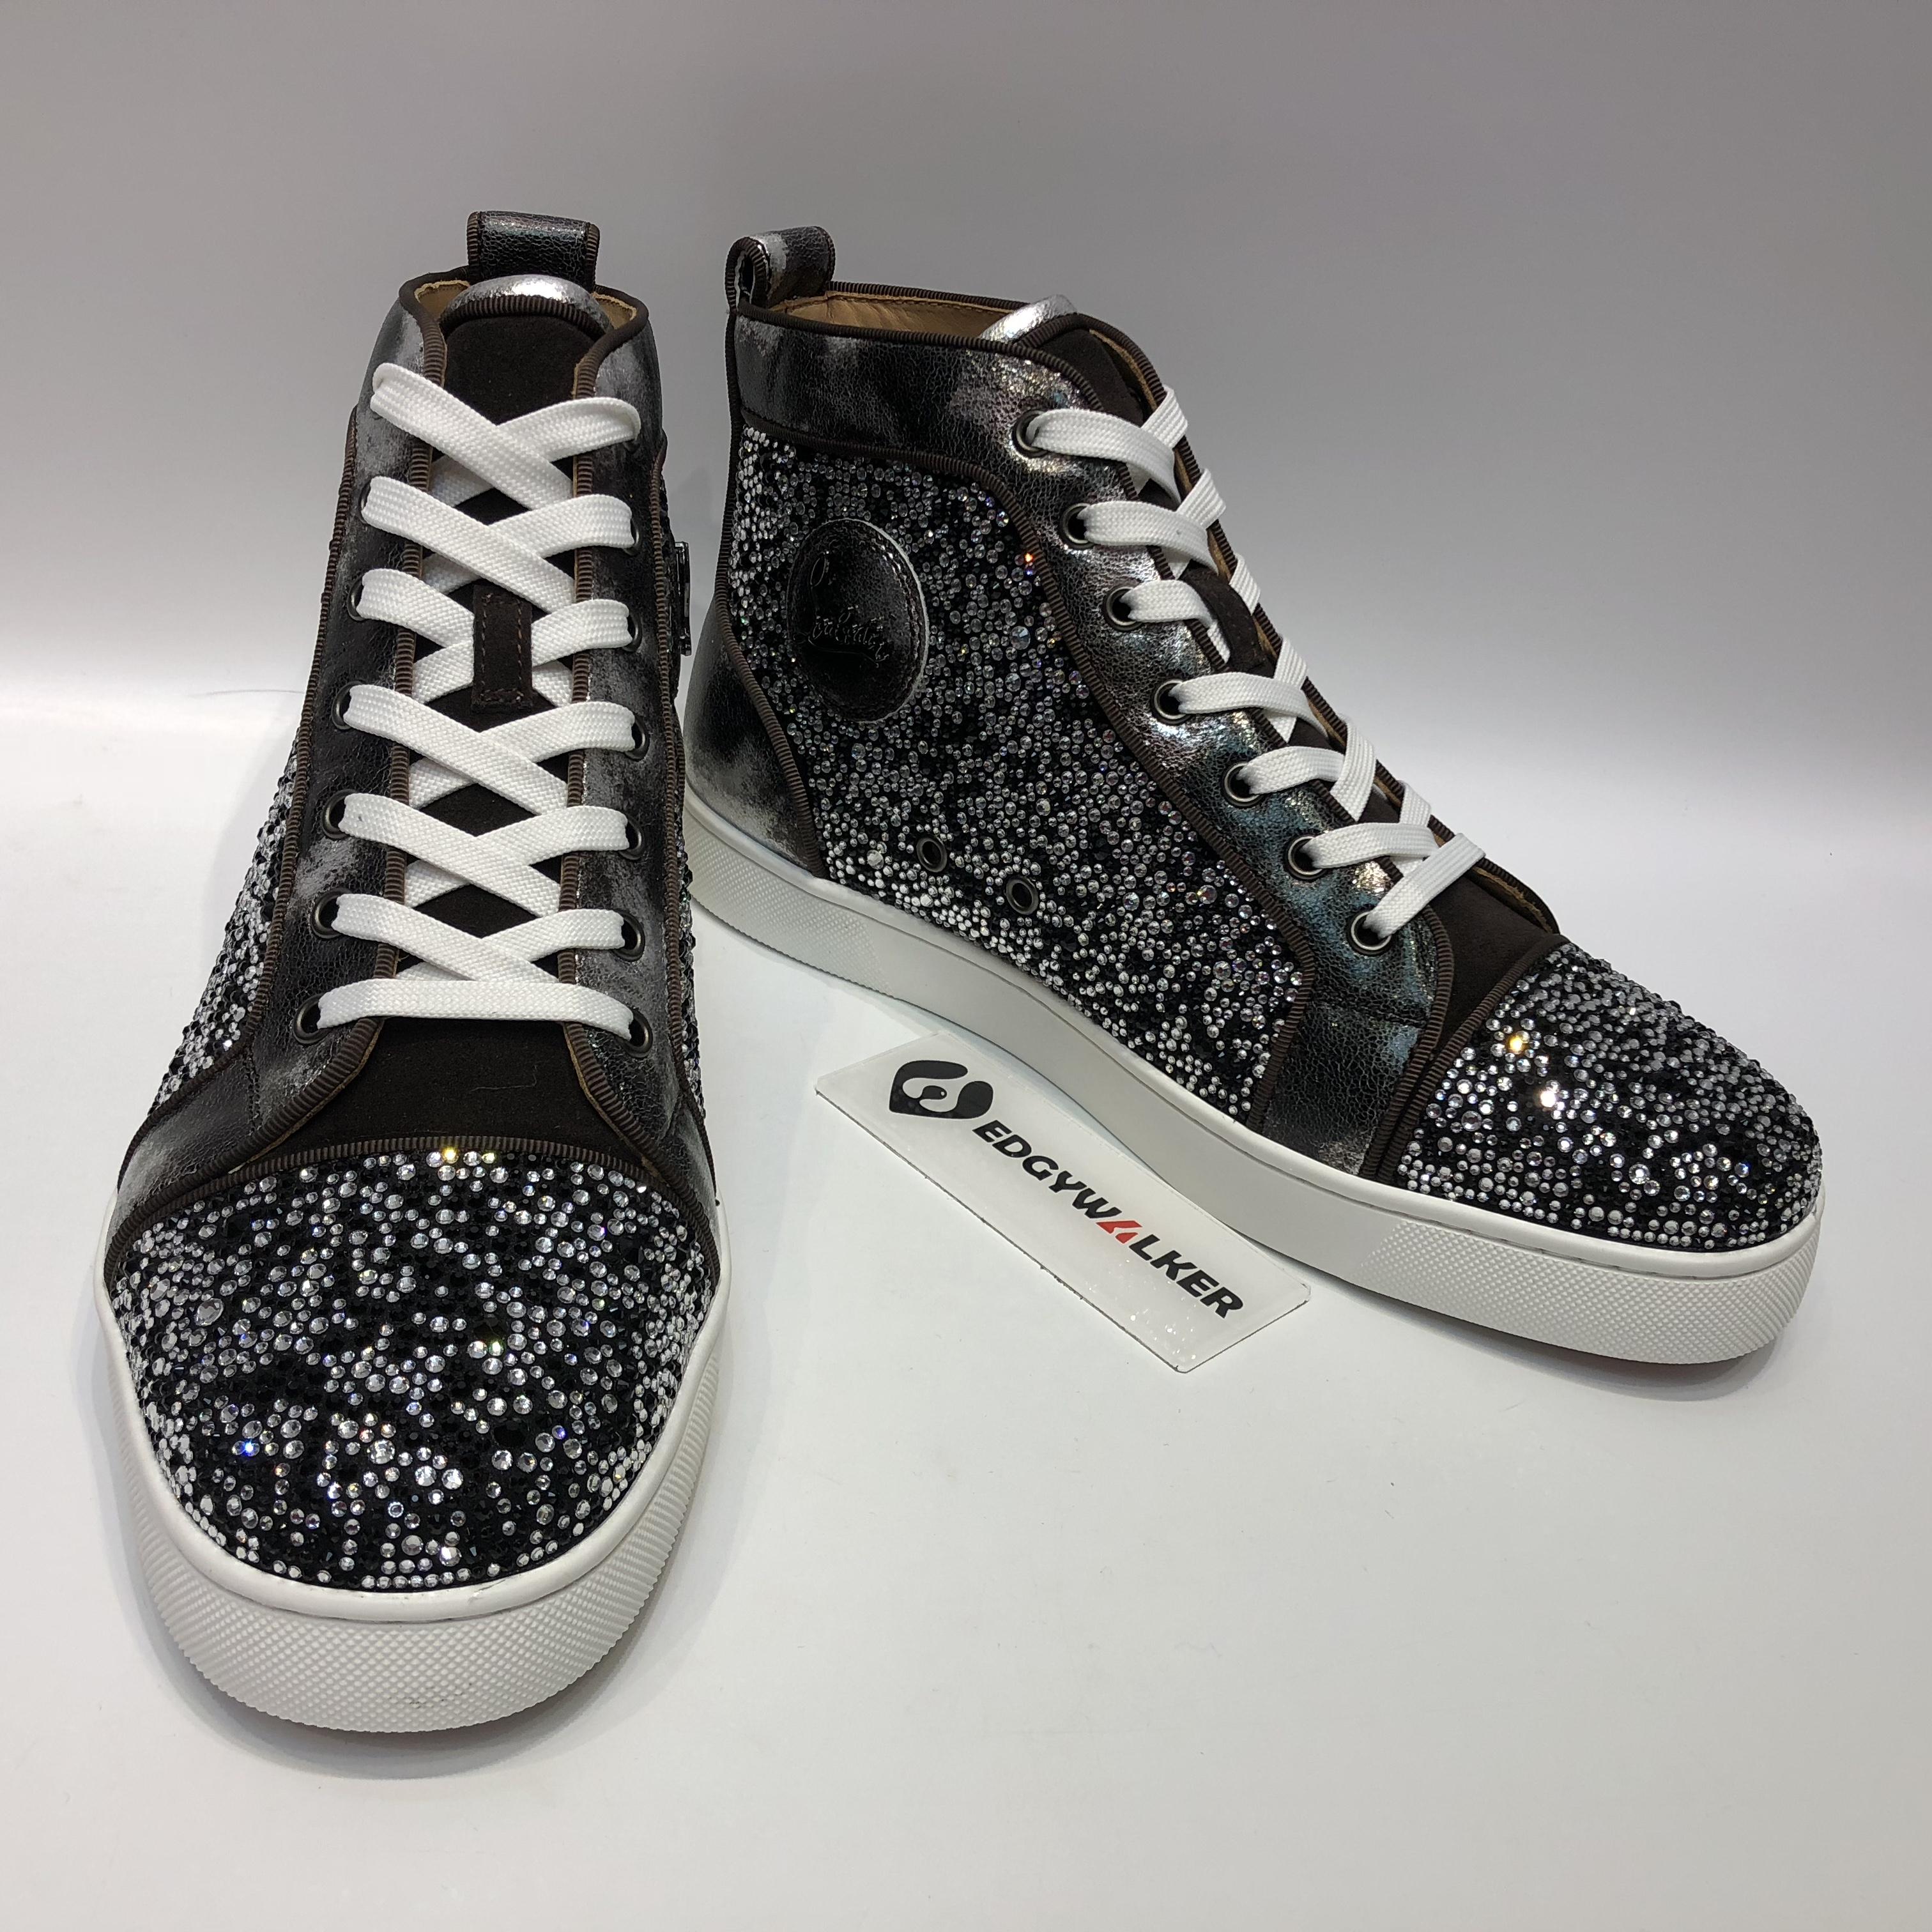 68c8783f57a CLSKH155 Louboutin Louis Orlato Men s Flat Reglisse Silver Highs Sneaker  Item NO  CLSKH155